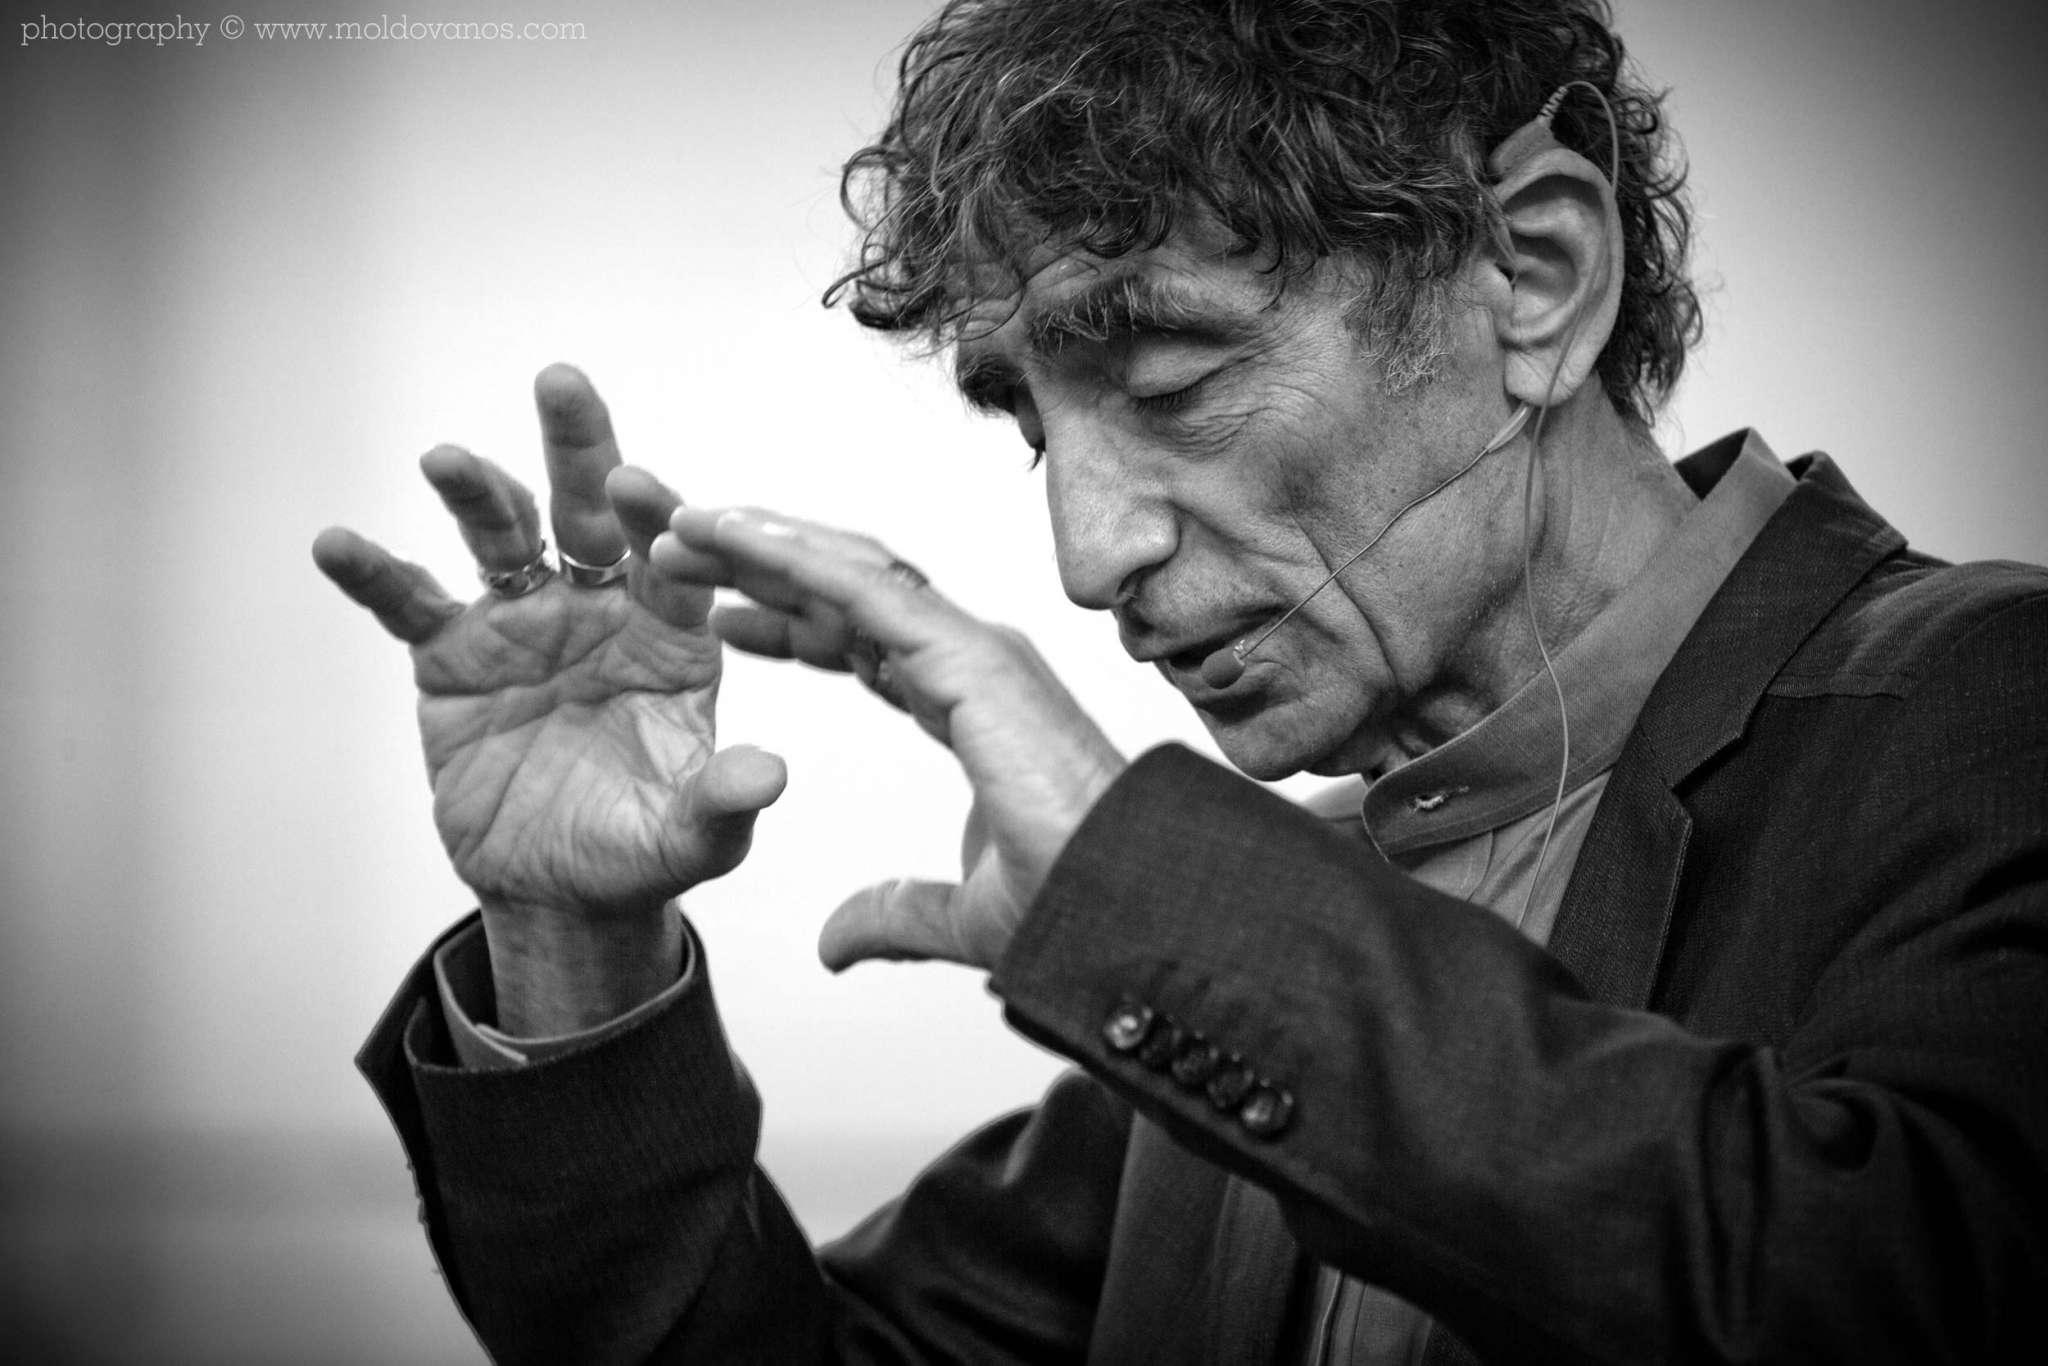 Best-selling Author Dr. Gabor Maté- Event Photography by Paul Moldovanos © moldovanos.com